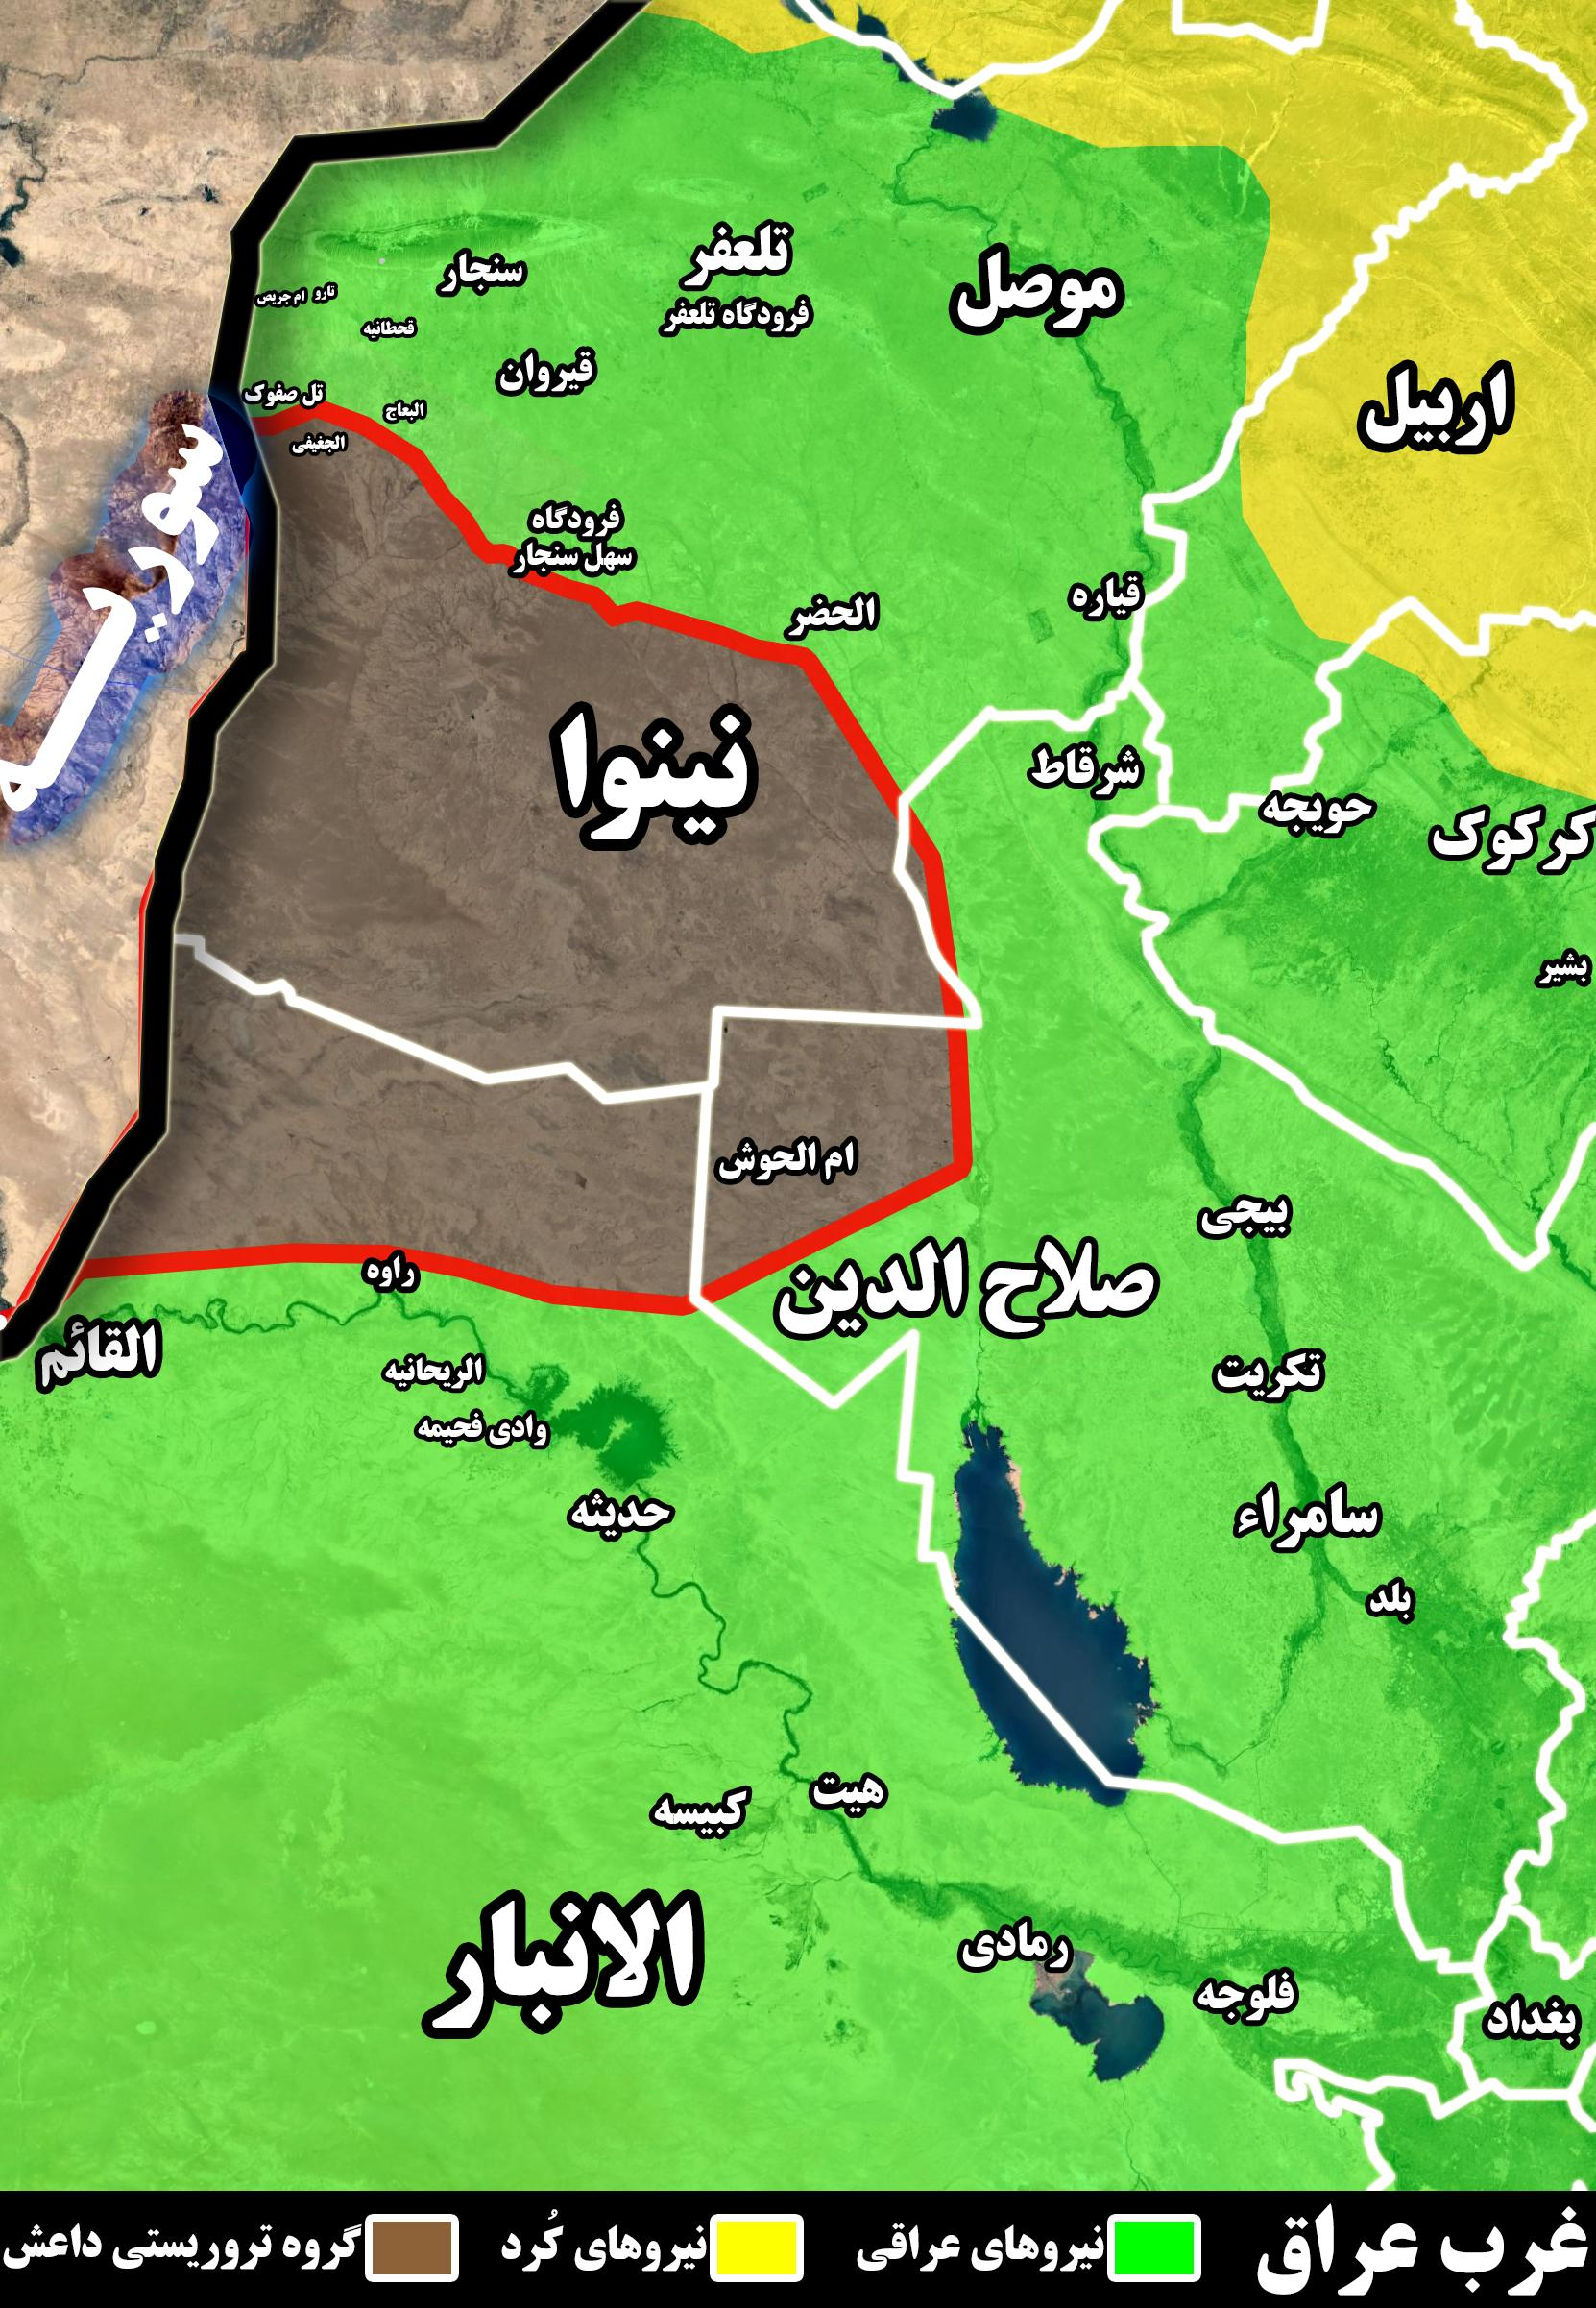 غرب عراق